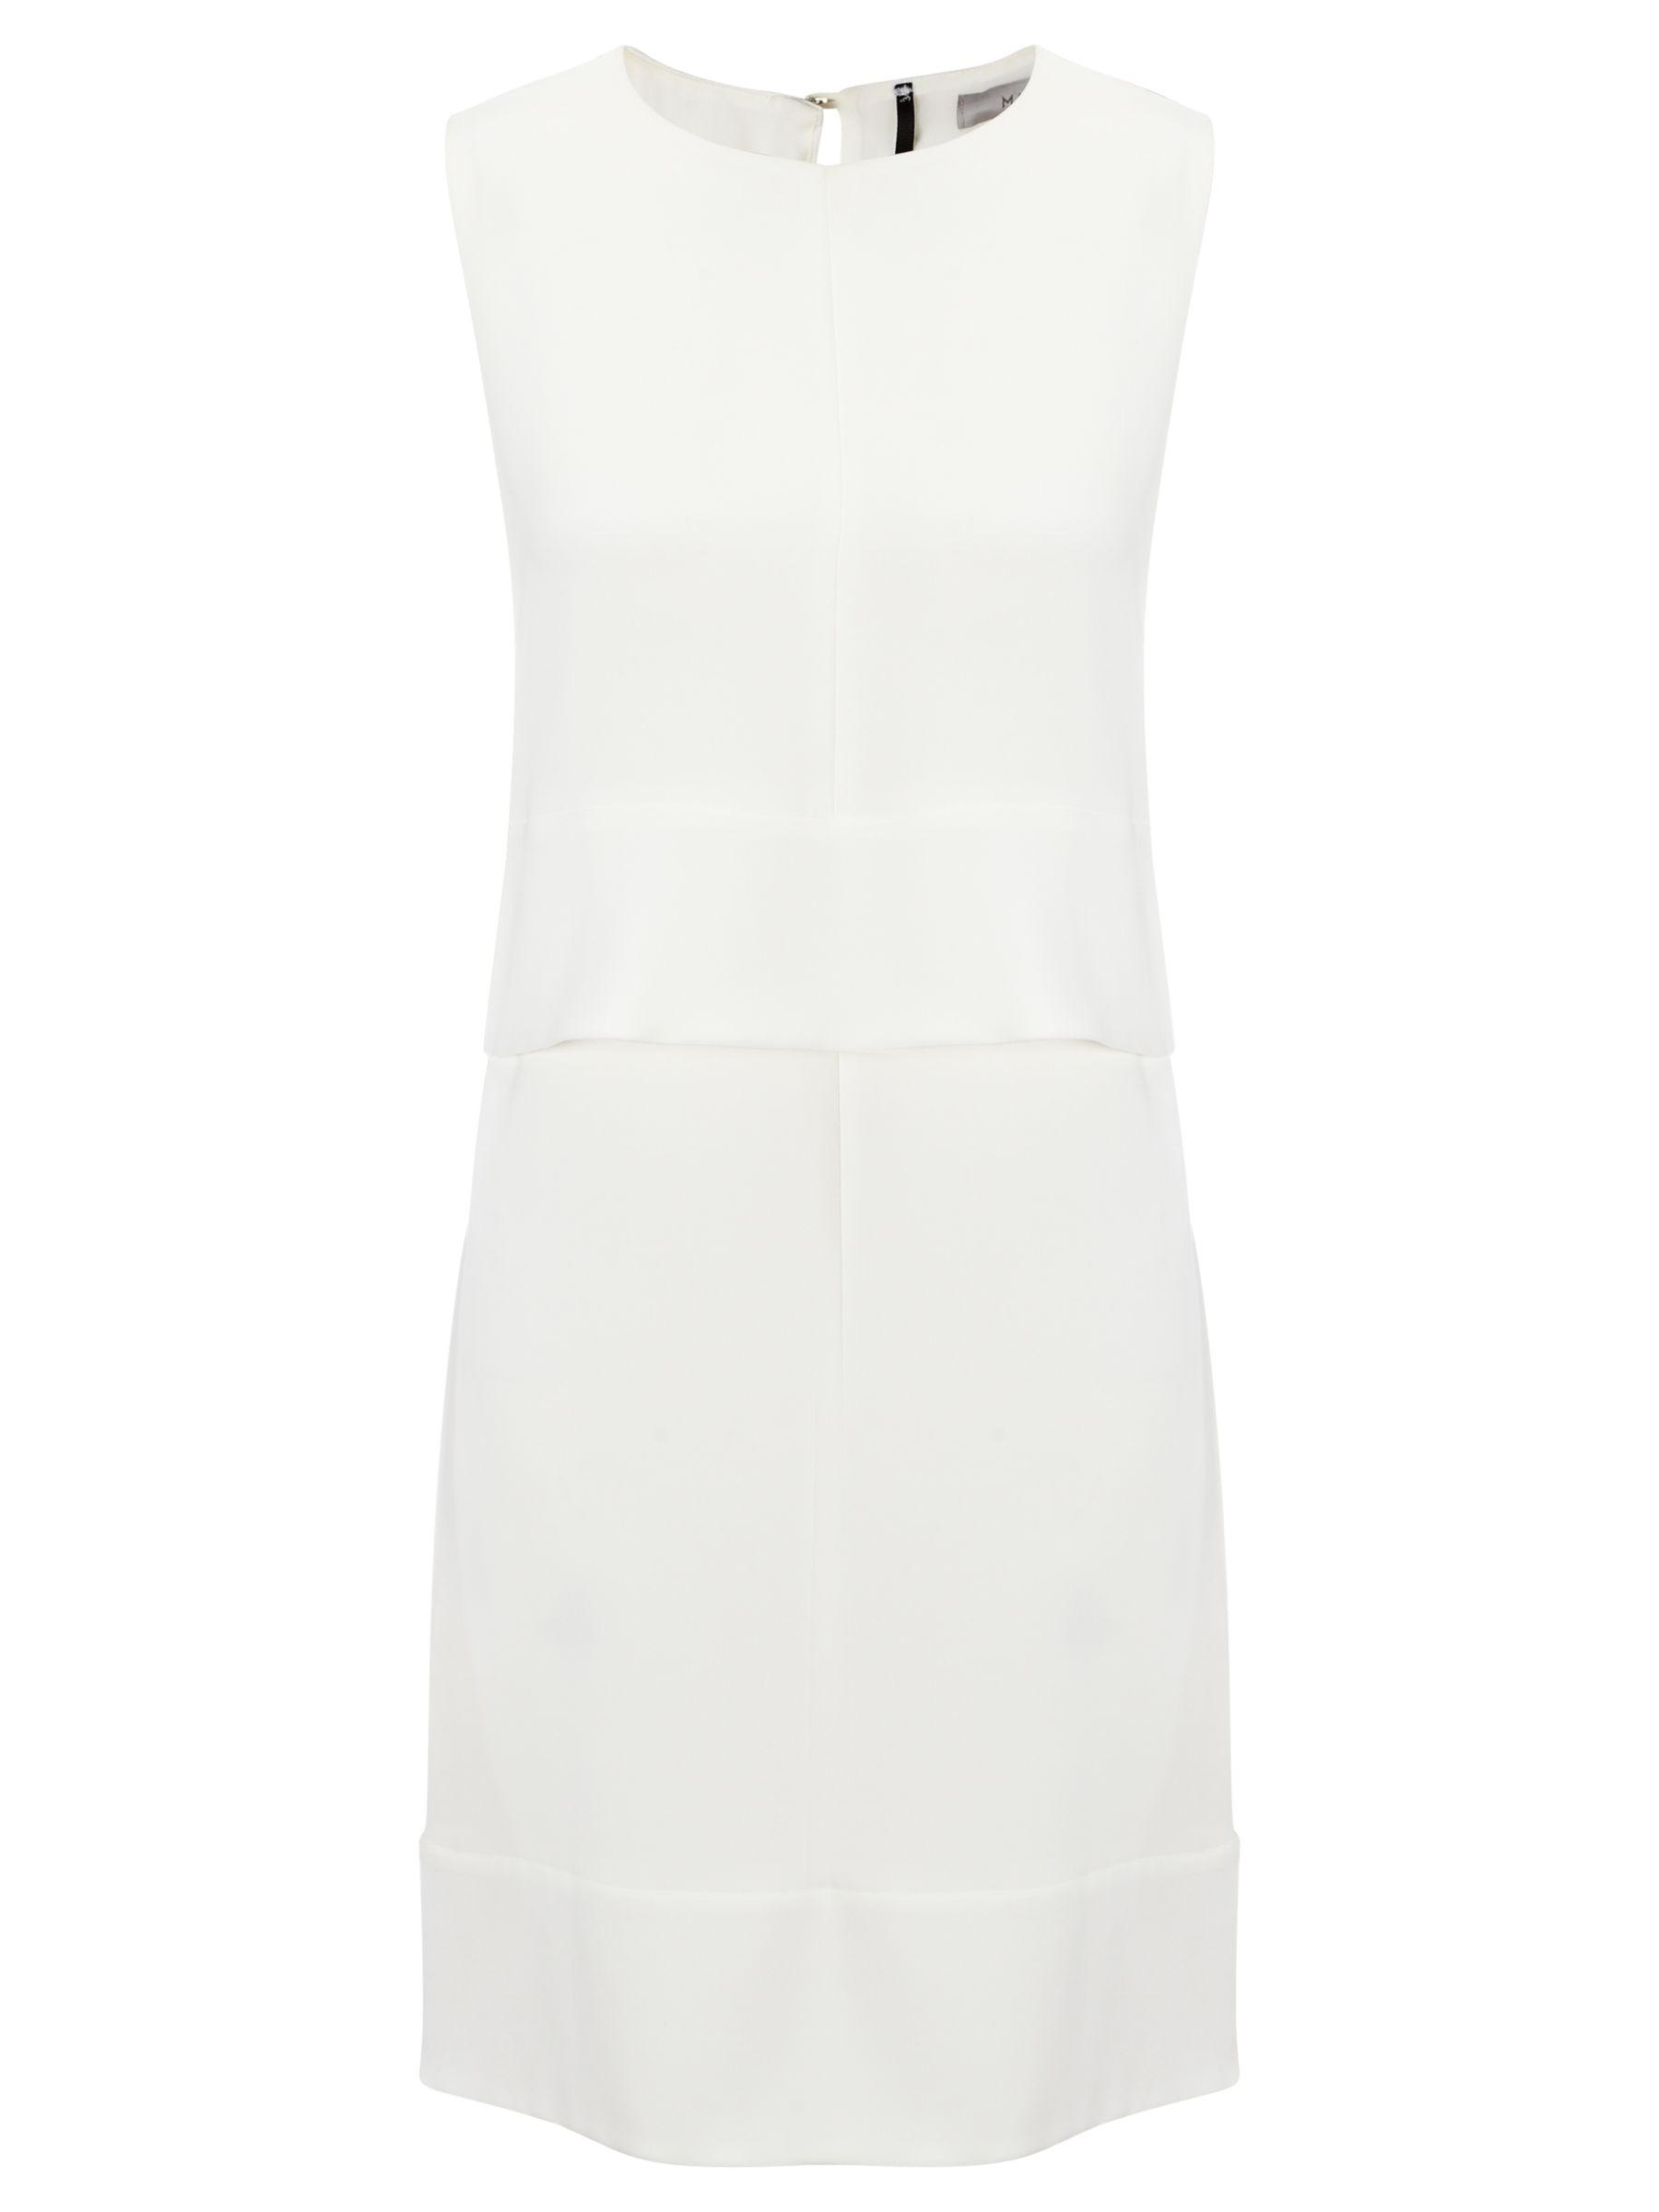 marella crop overlay dress white, marella, crop, overlay, dress, white, 8|16|10|12|14, edition magazine, white out, women, womens dresses, 1757078